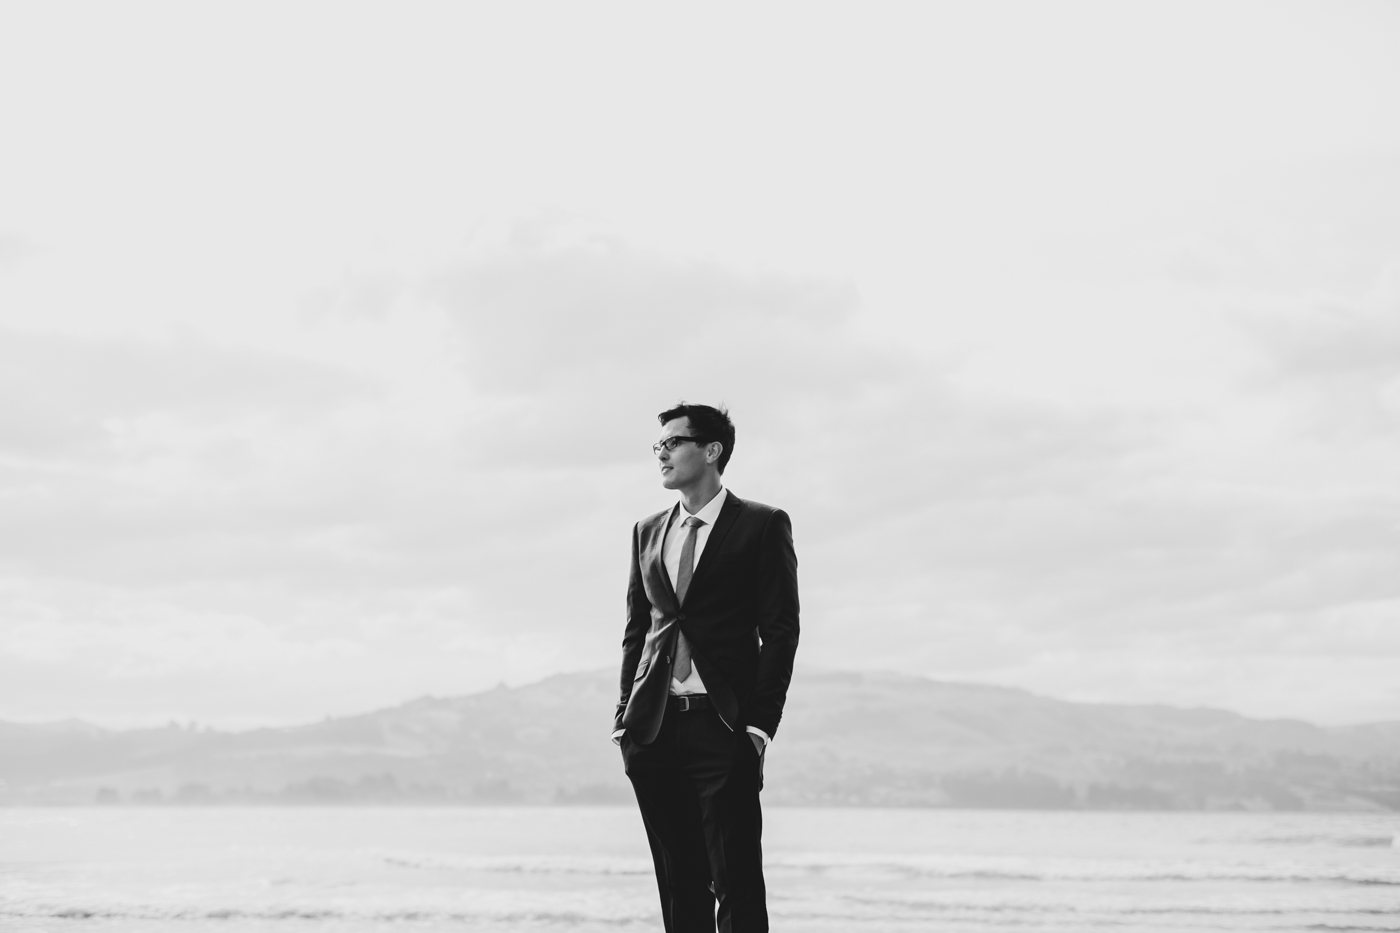 Ariana & Tim - Dunedin, New Zealand Wedding - Destination Wedding - Samantha Heather Photography-143.jpg